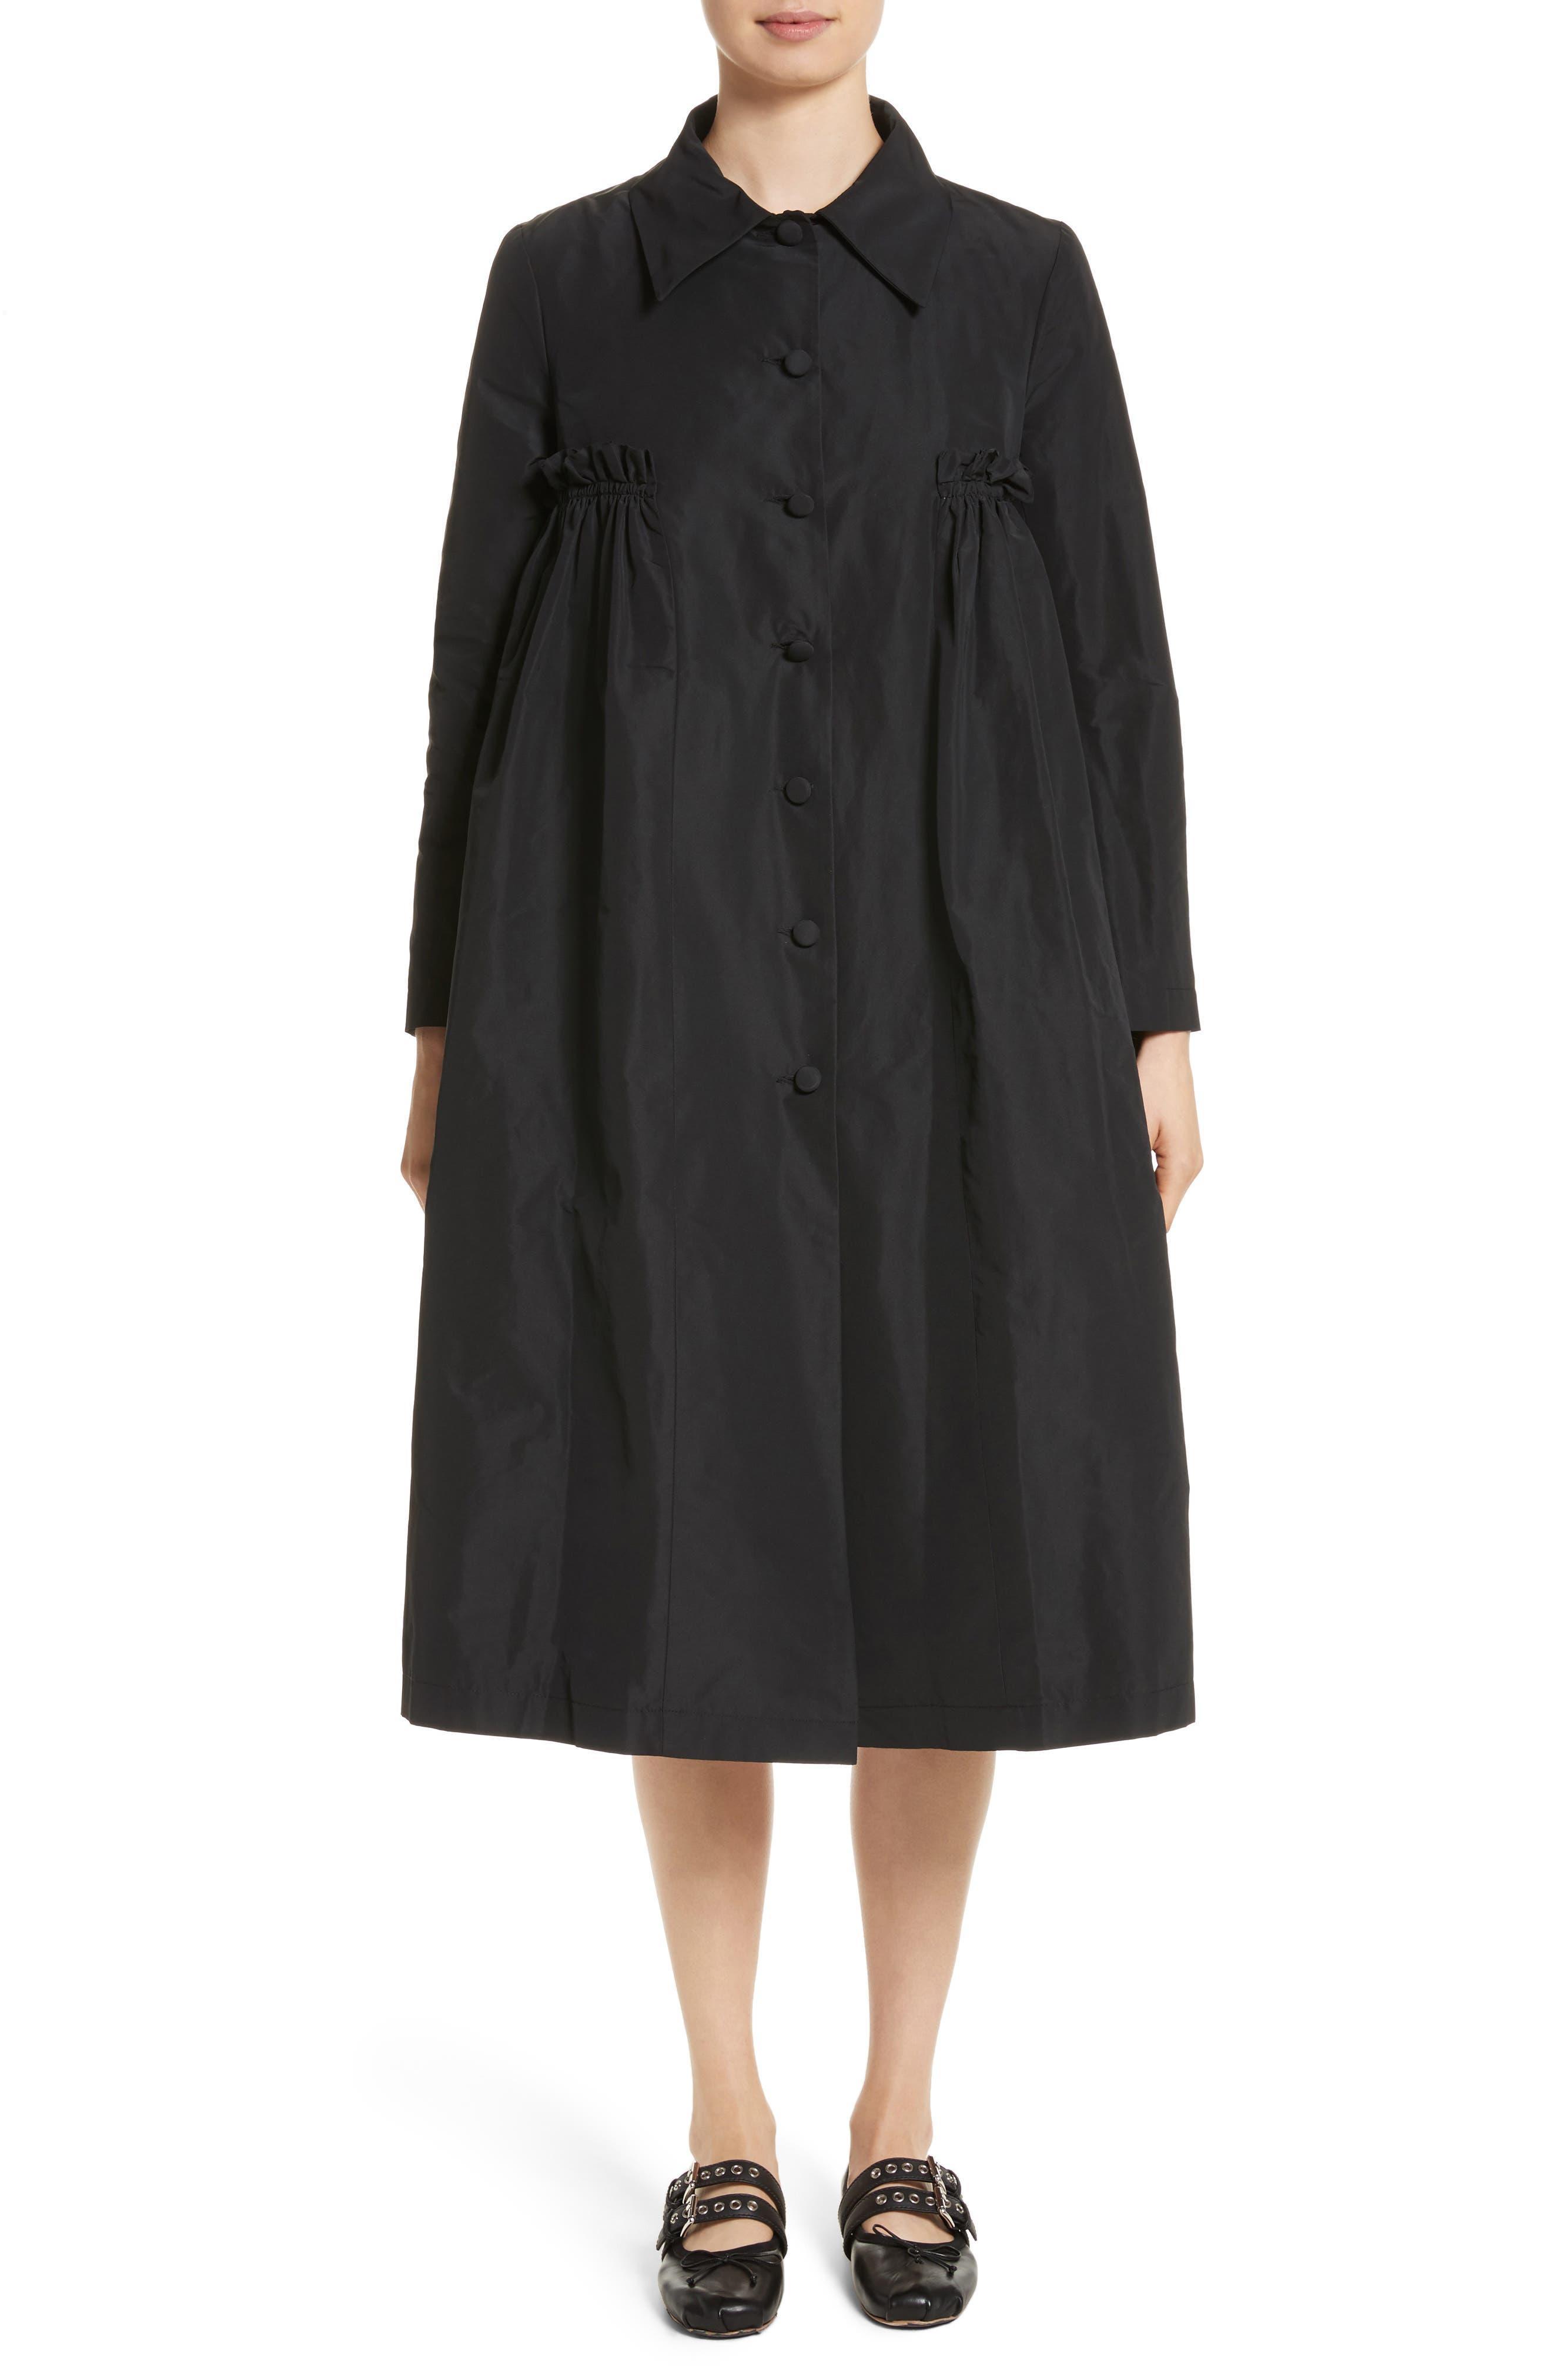 Molly Goddard Pluto Taffeta Coat